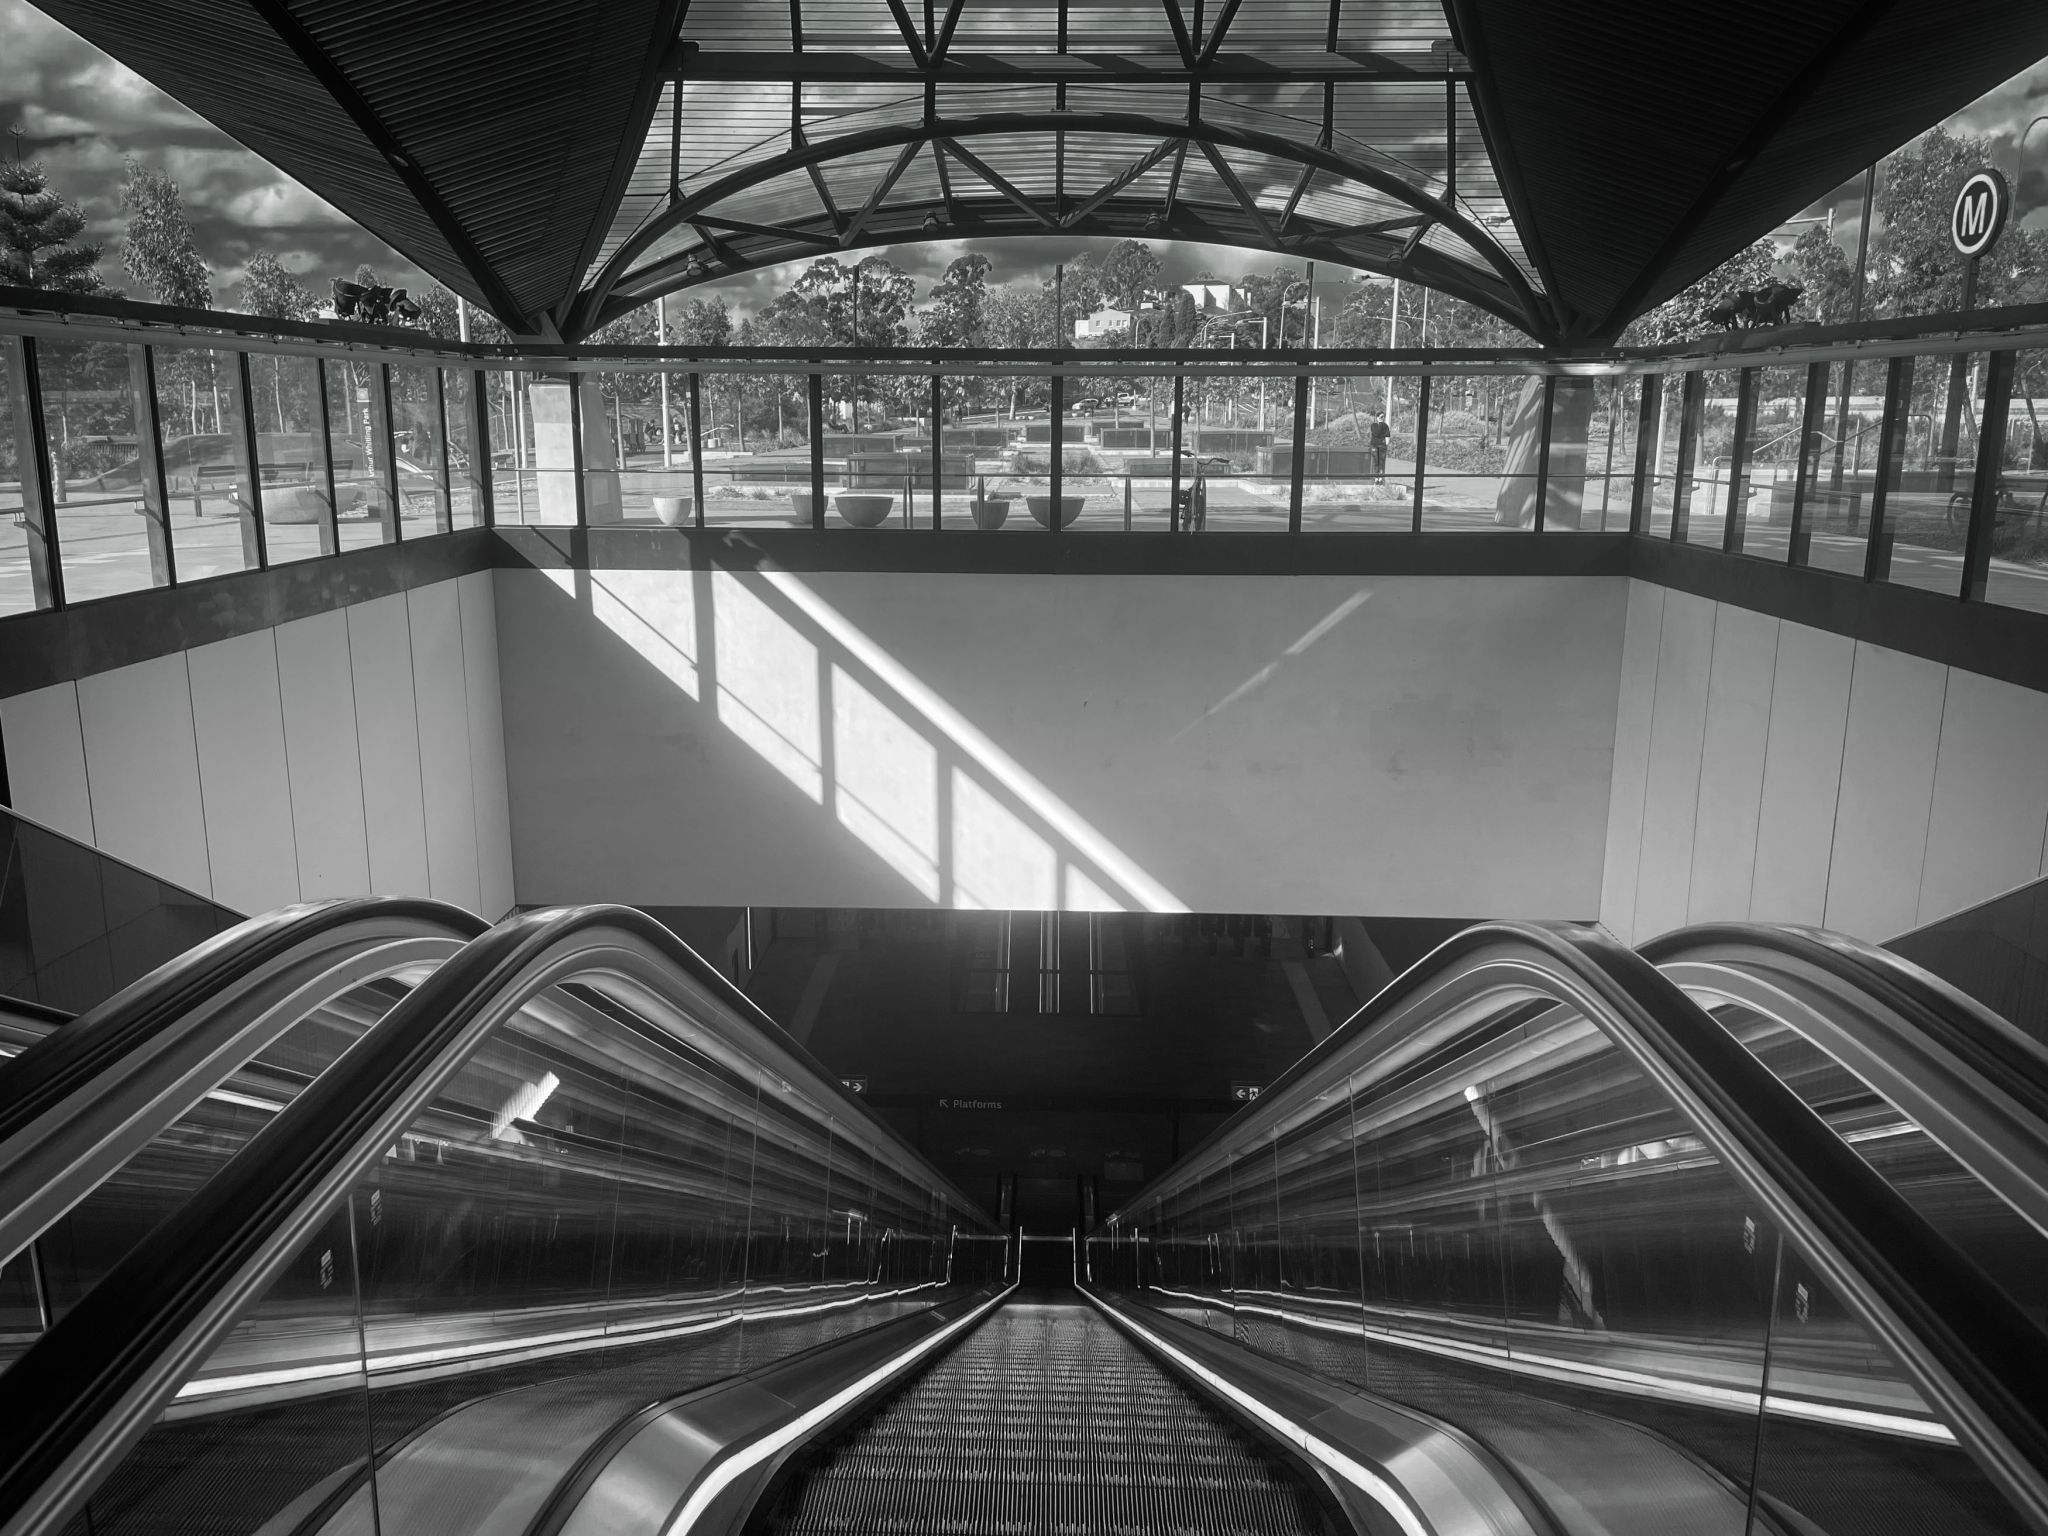 Down the Escalator Train station, Castle Hill, Sydney, Australia